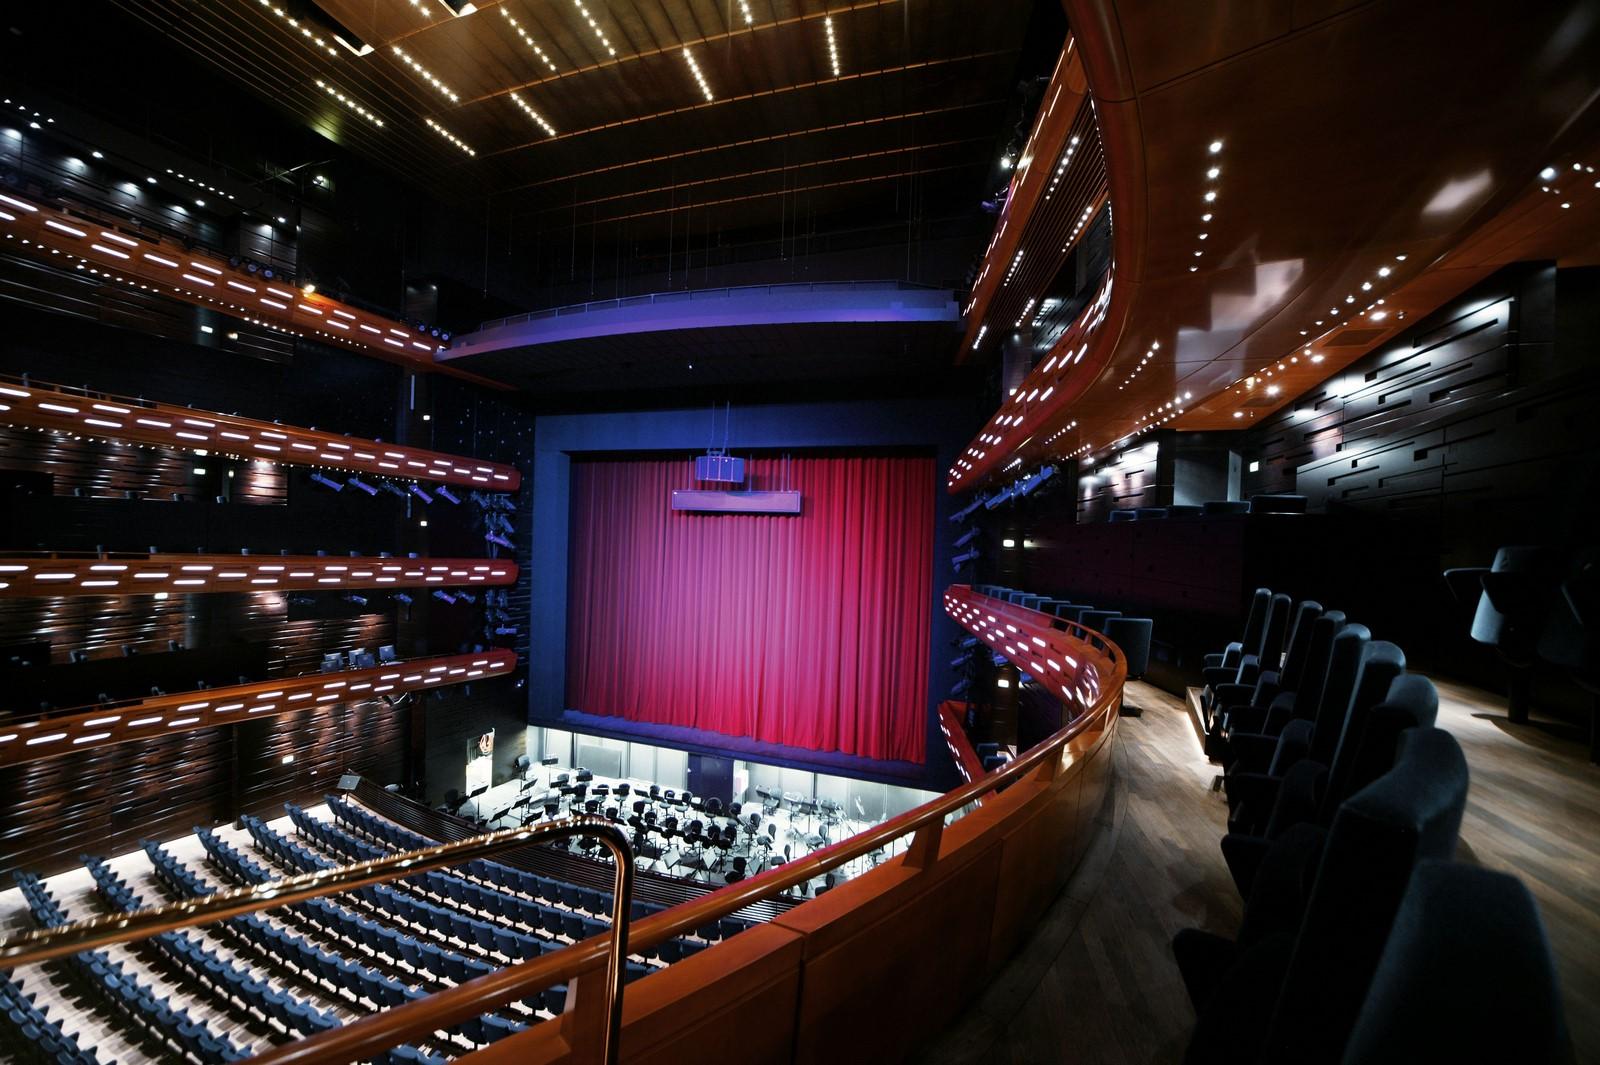 Teaterblik: Anbefaling: Operakoncerter med Operaakademiet